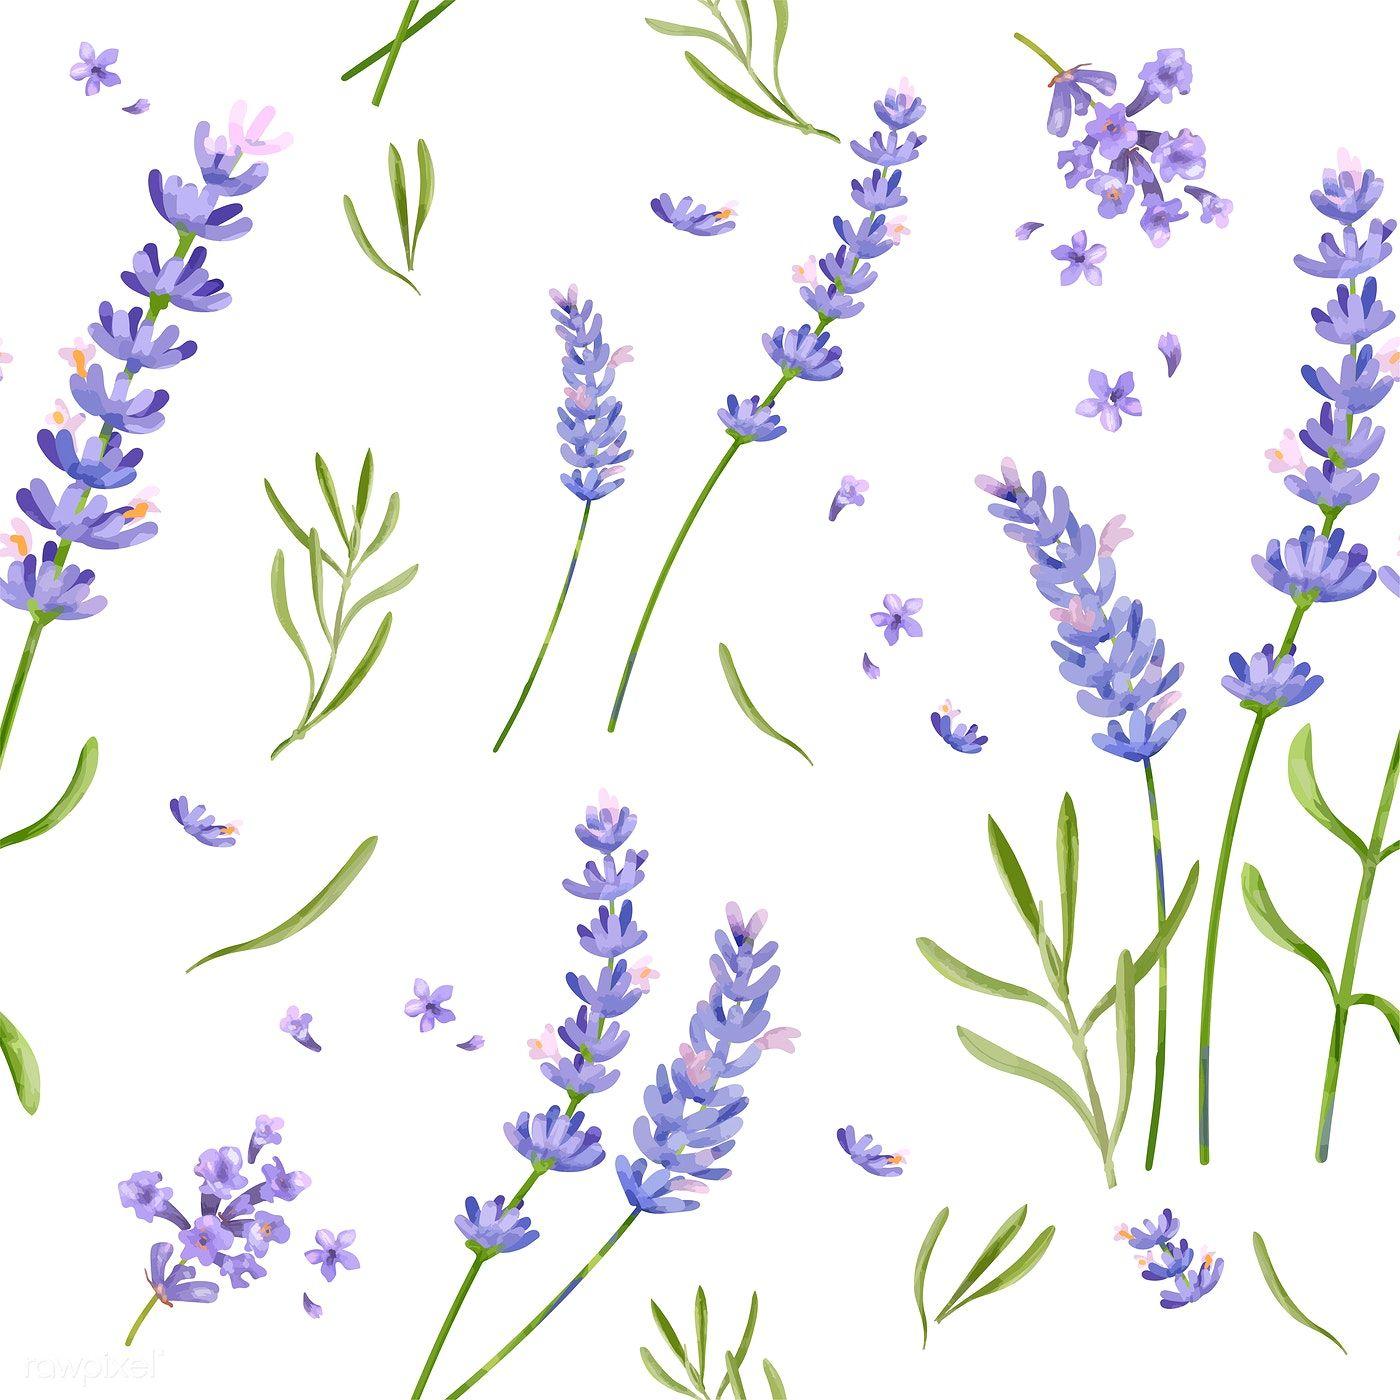 Download Premium Vector Of Hand Drawn Lavender Flower Pattern 421500 Flower Drawing Phlox Flowers Lavender Flowers